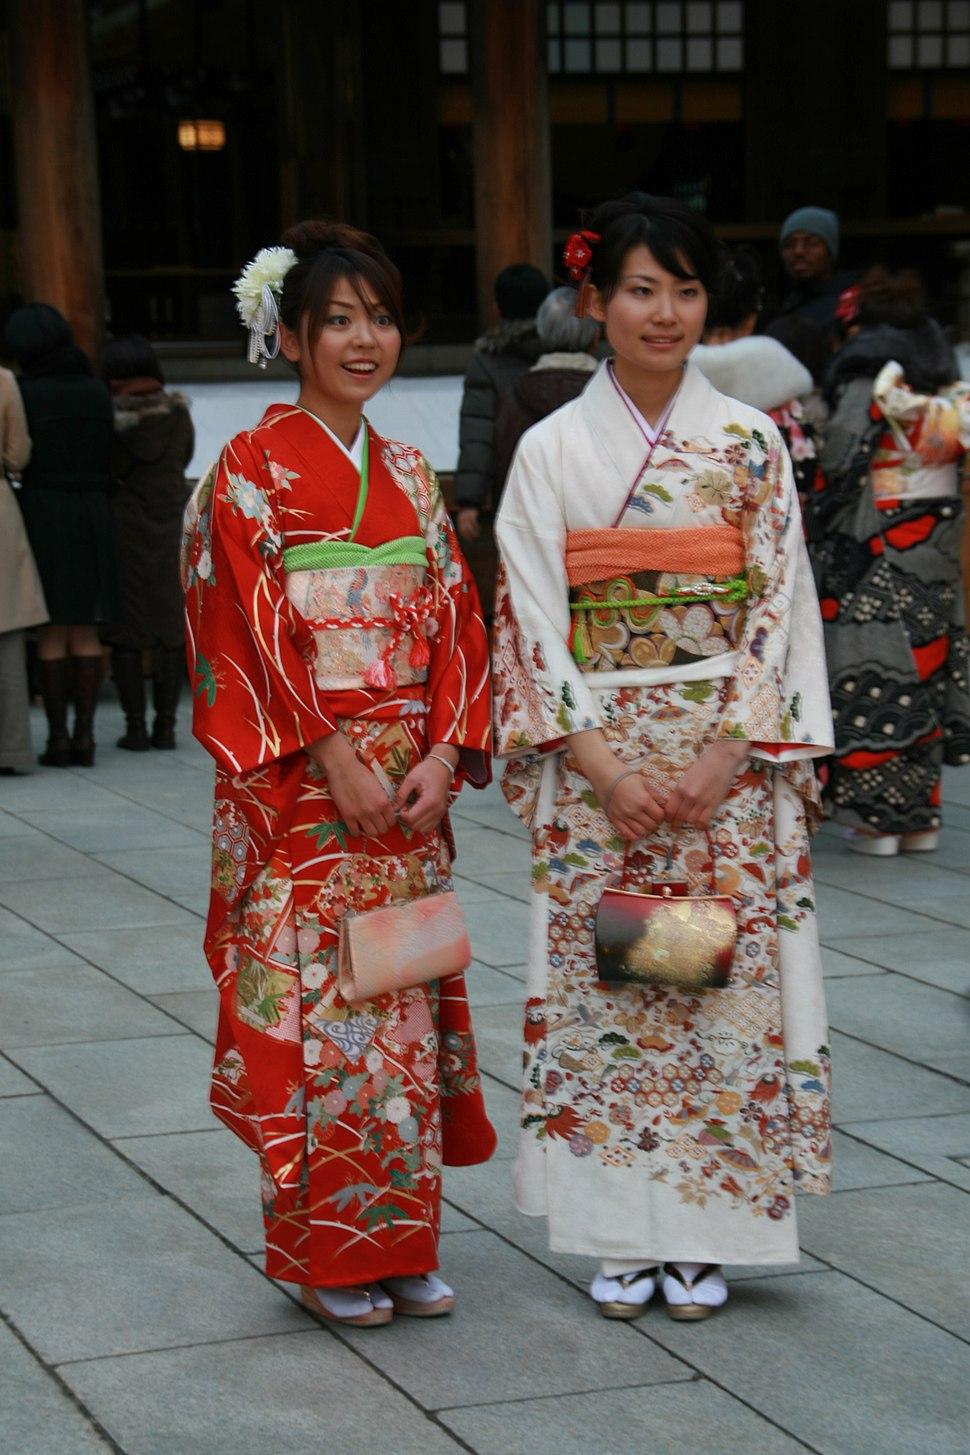 Harajuku, 2 young ladies smiling